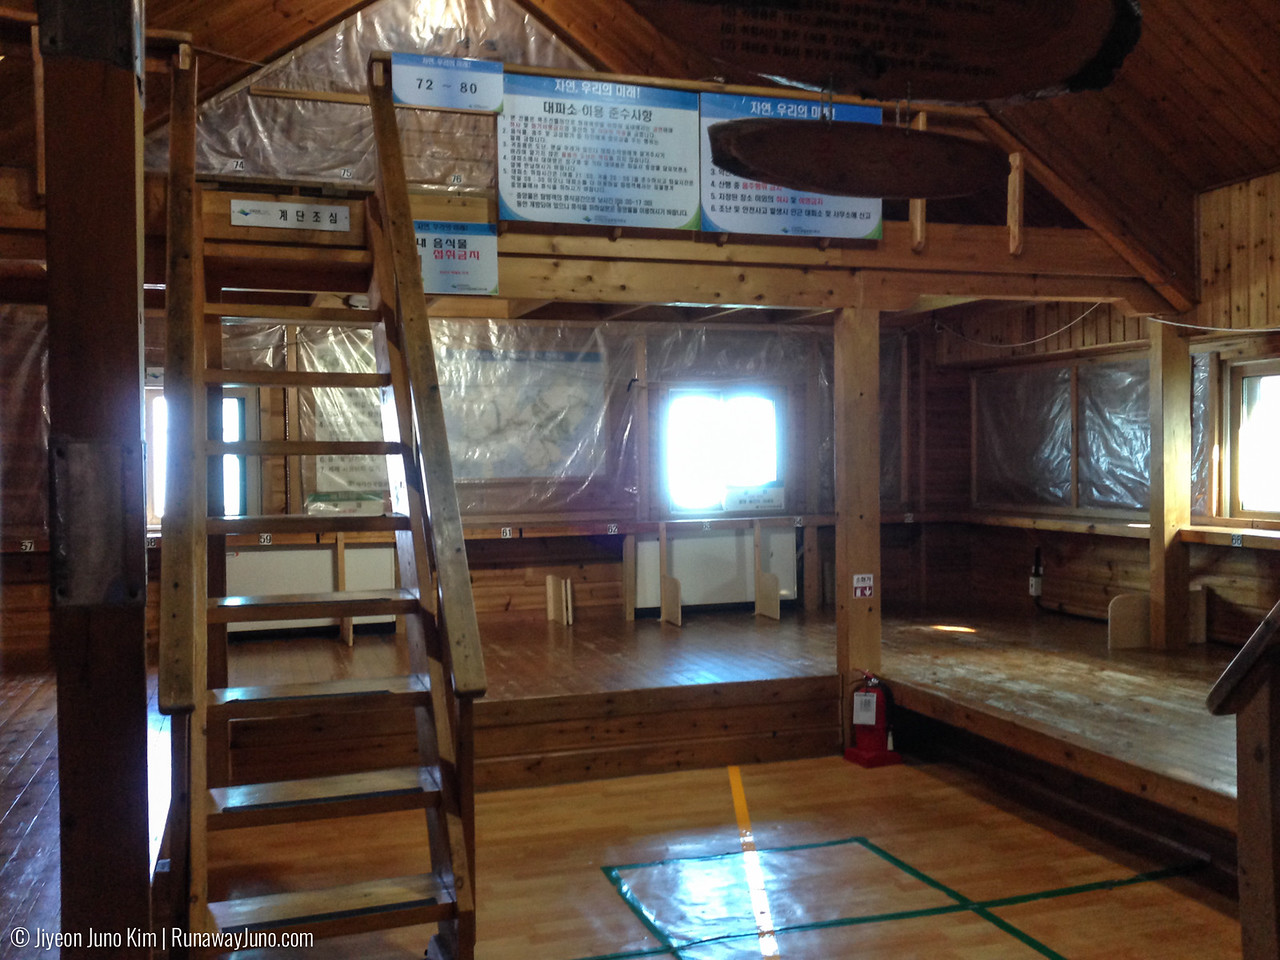 Byeoksoryeong Shelter inside